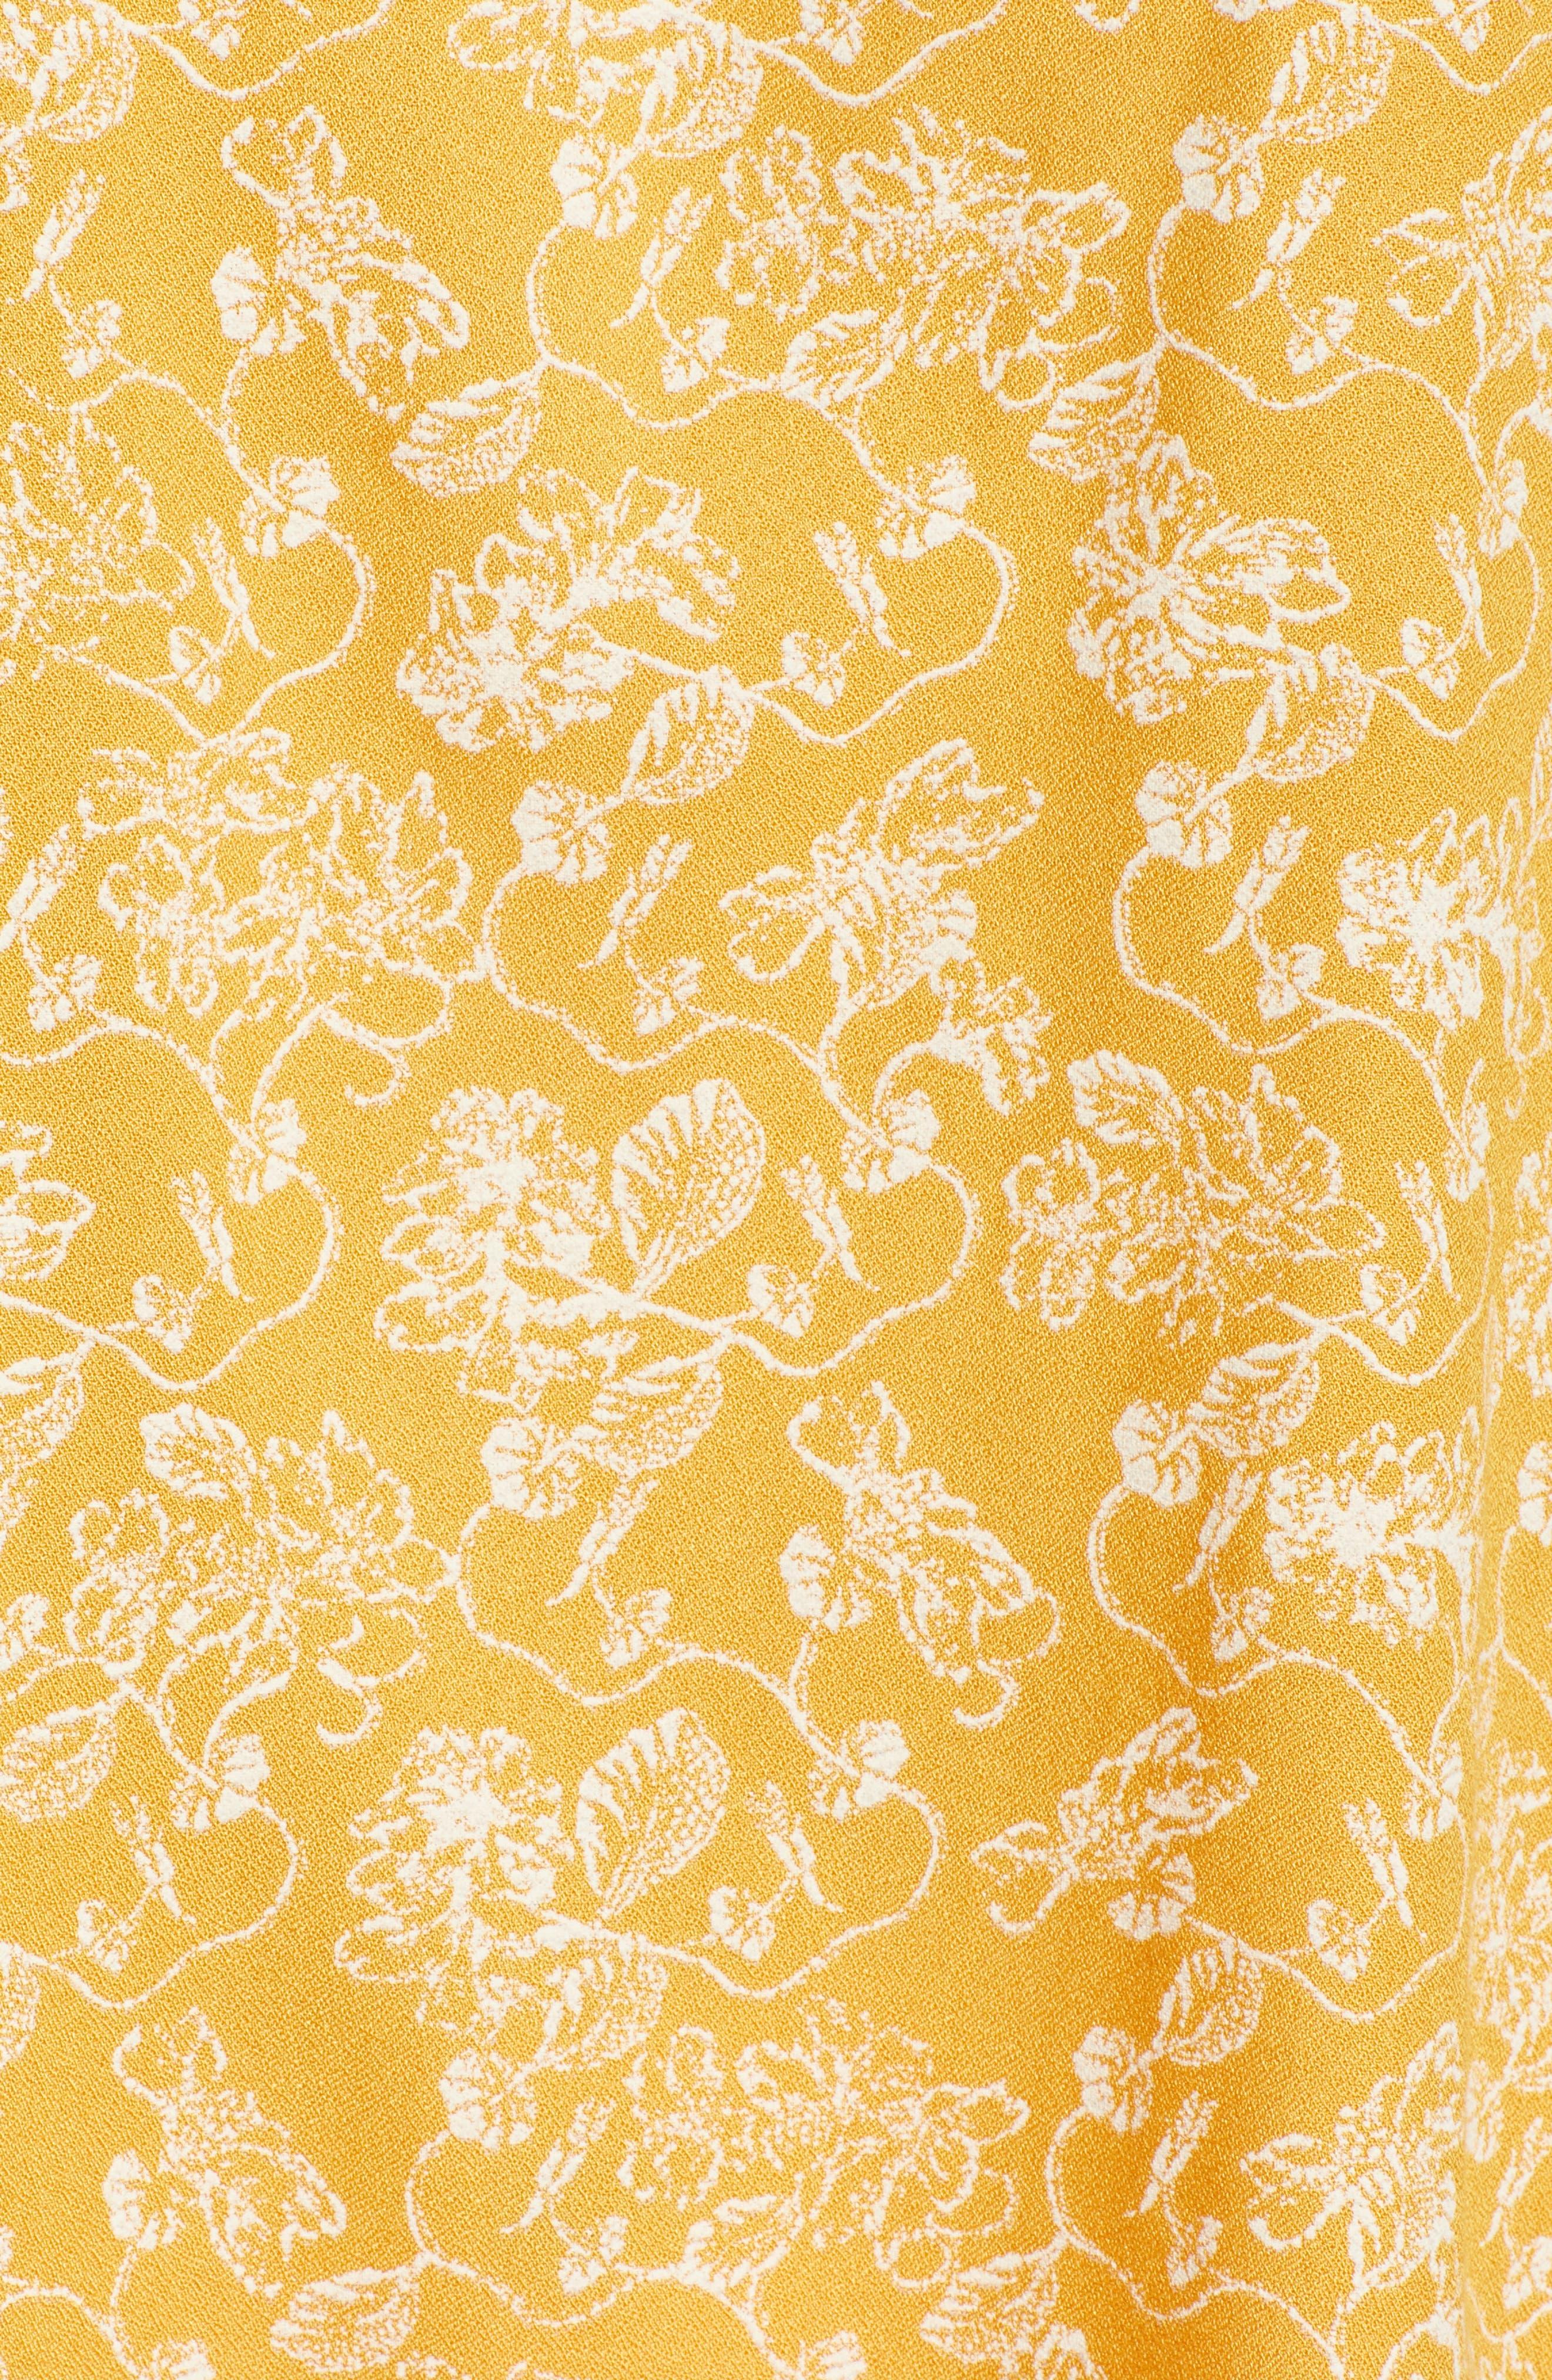 Split Neck Top,                             Alternate thumbnail 6, color,                             Yellow Gleam Floral Stencil